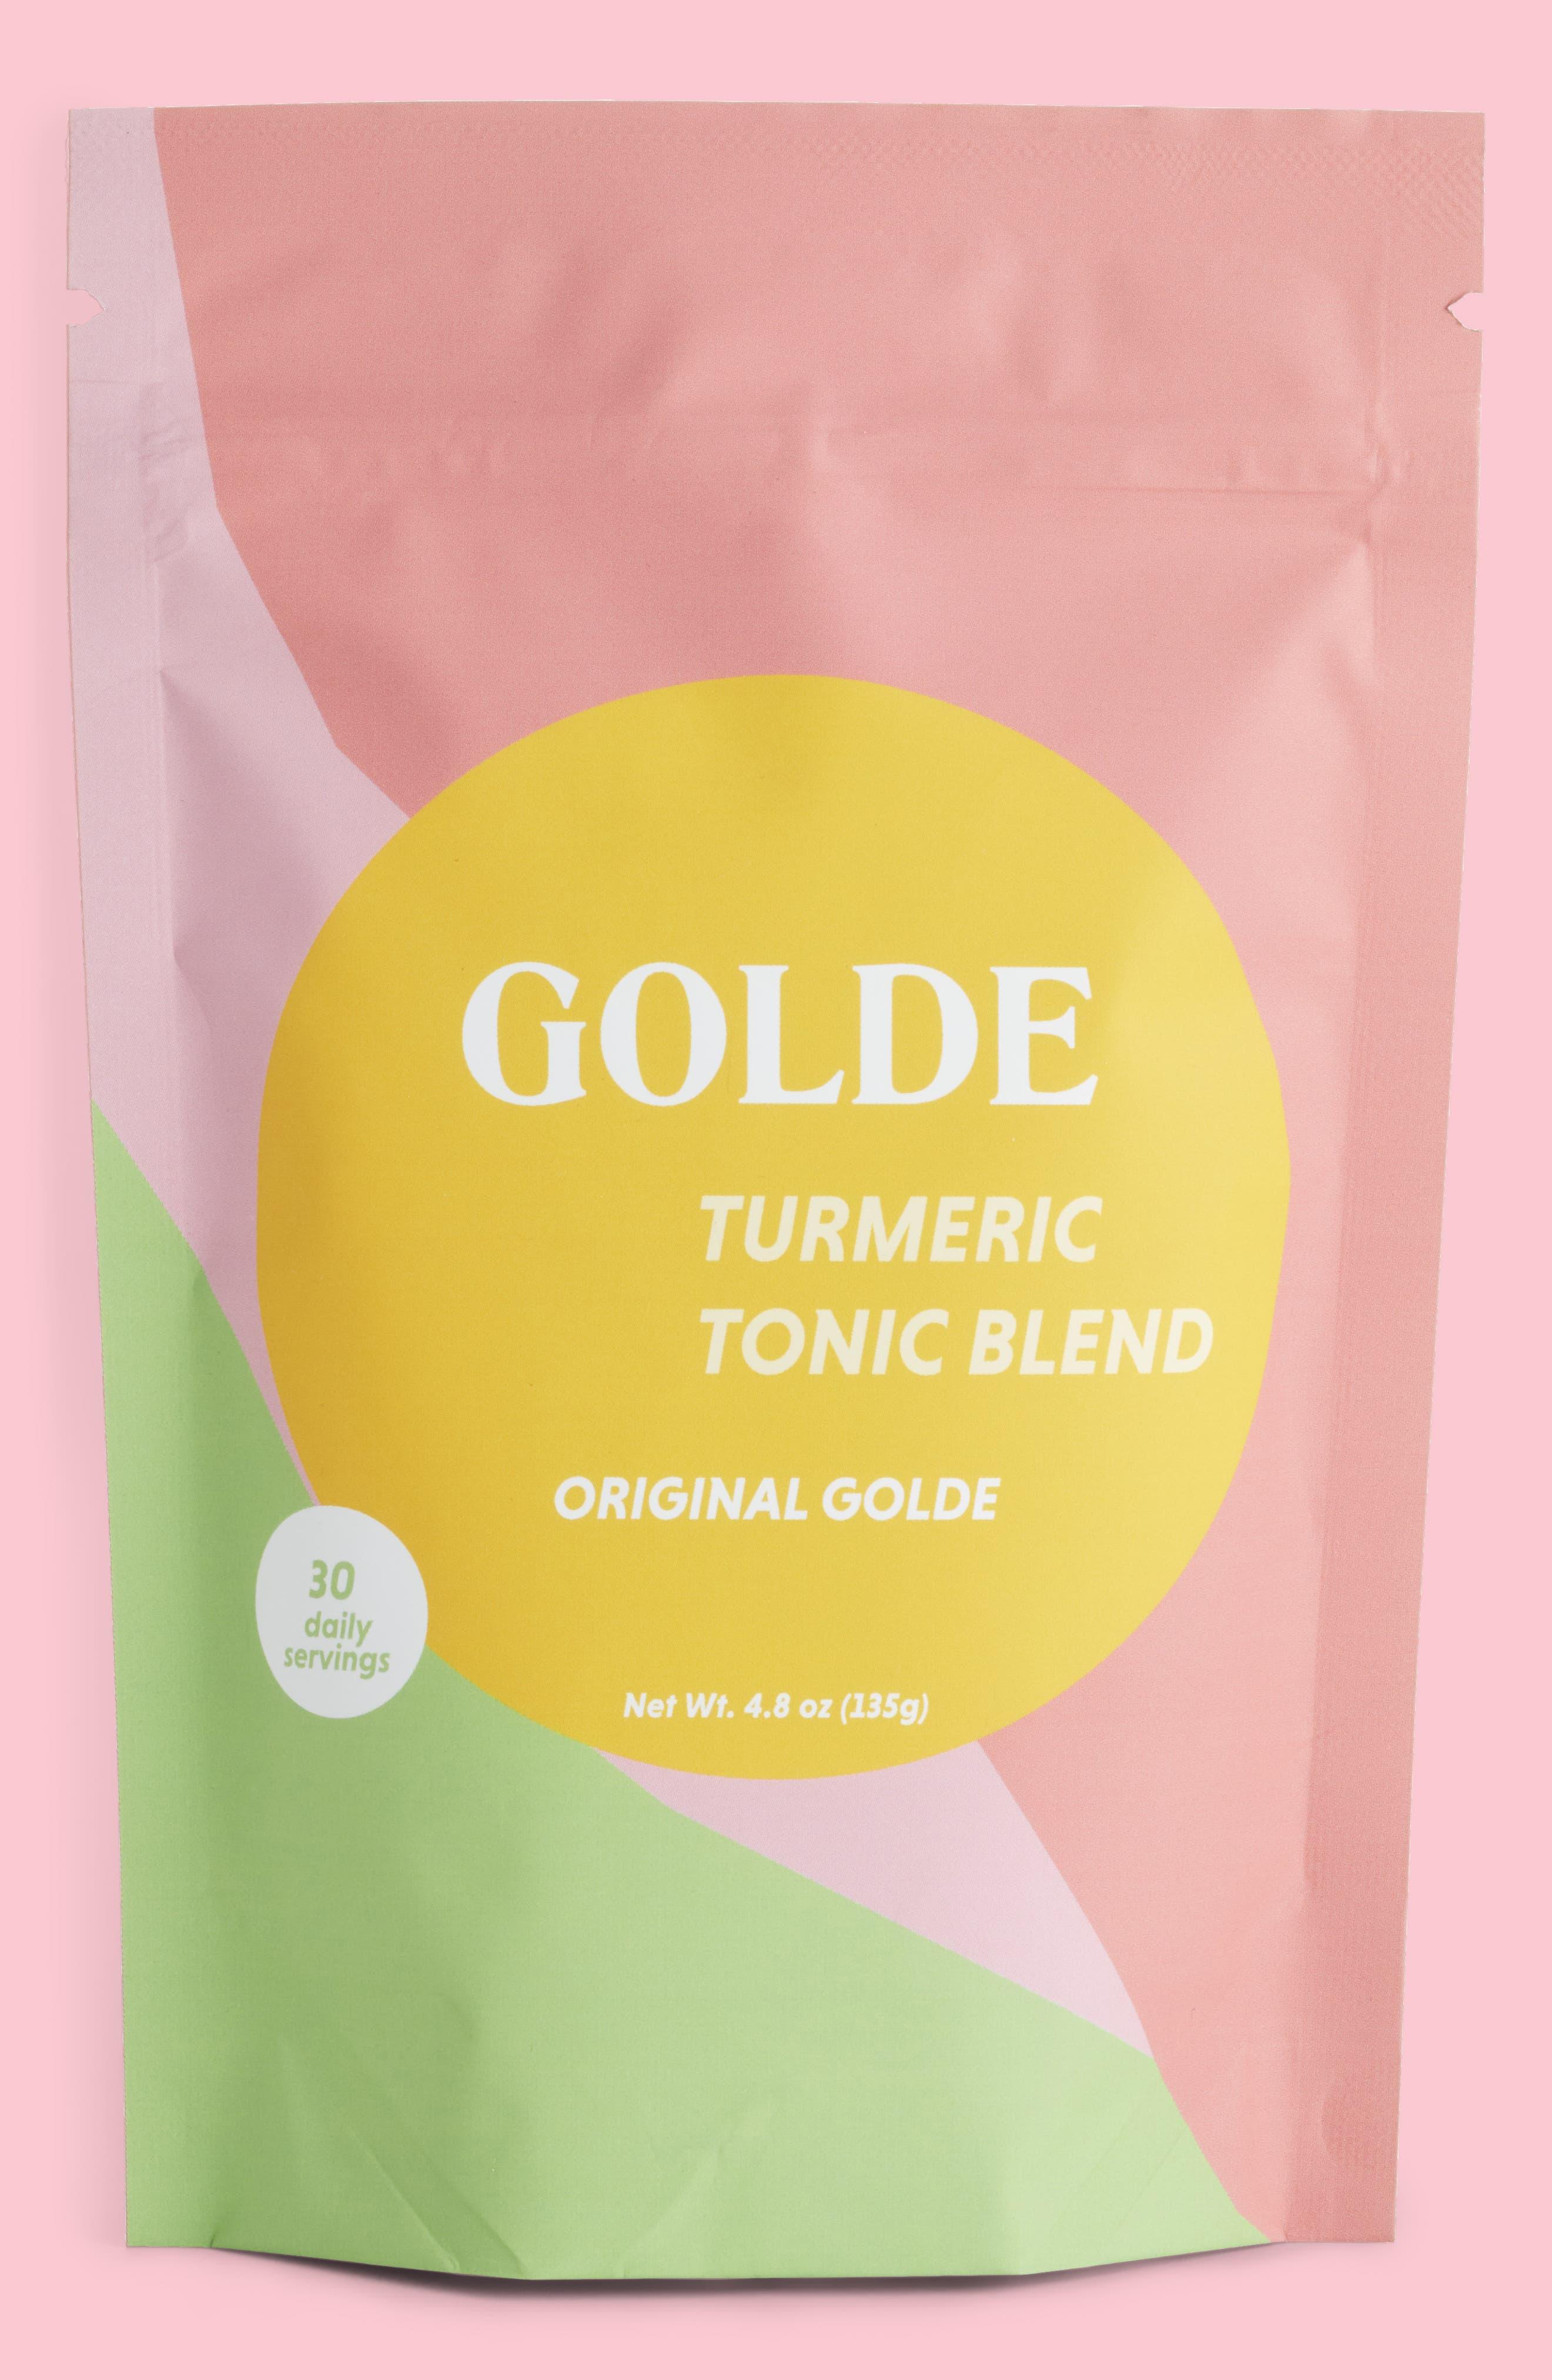 Golde Original Golde Turmeric Tonic Blend,                         Main,                         color, None